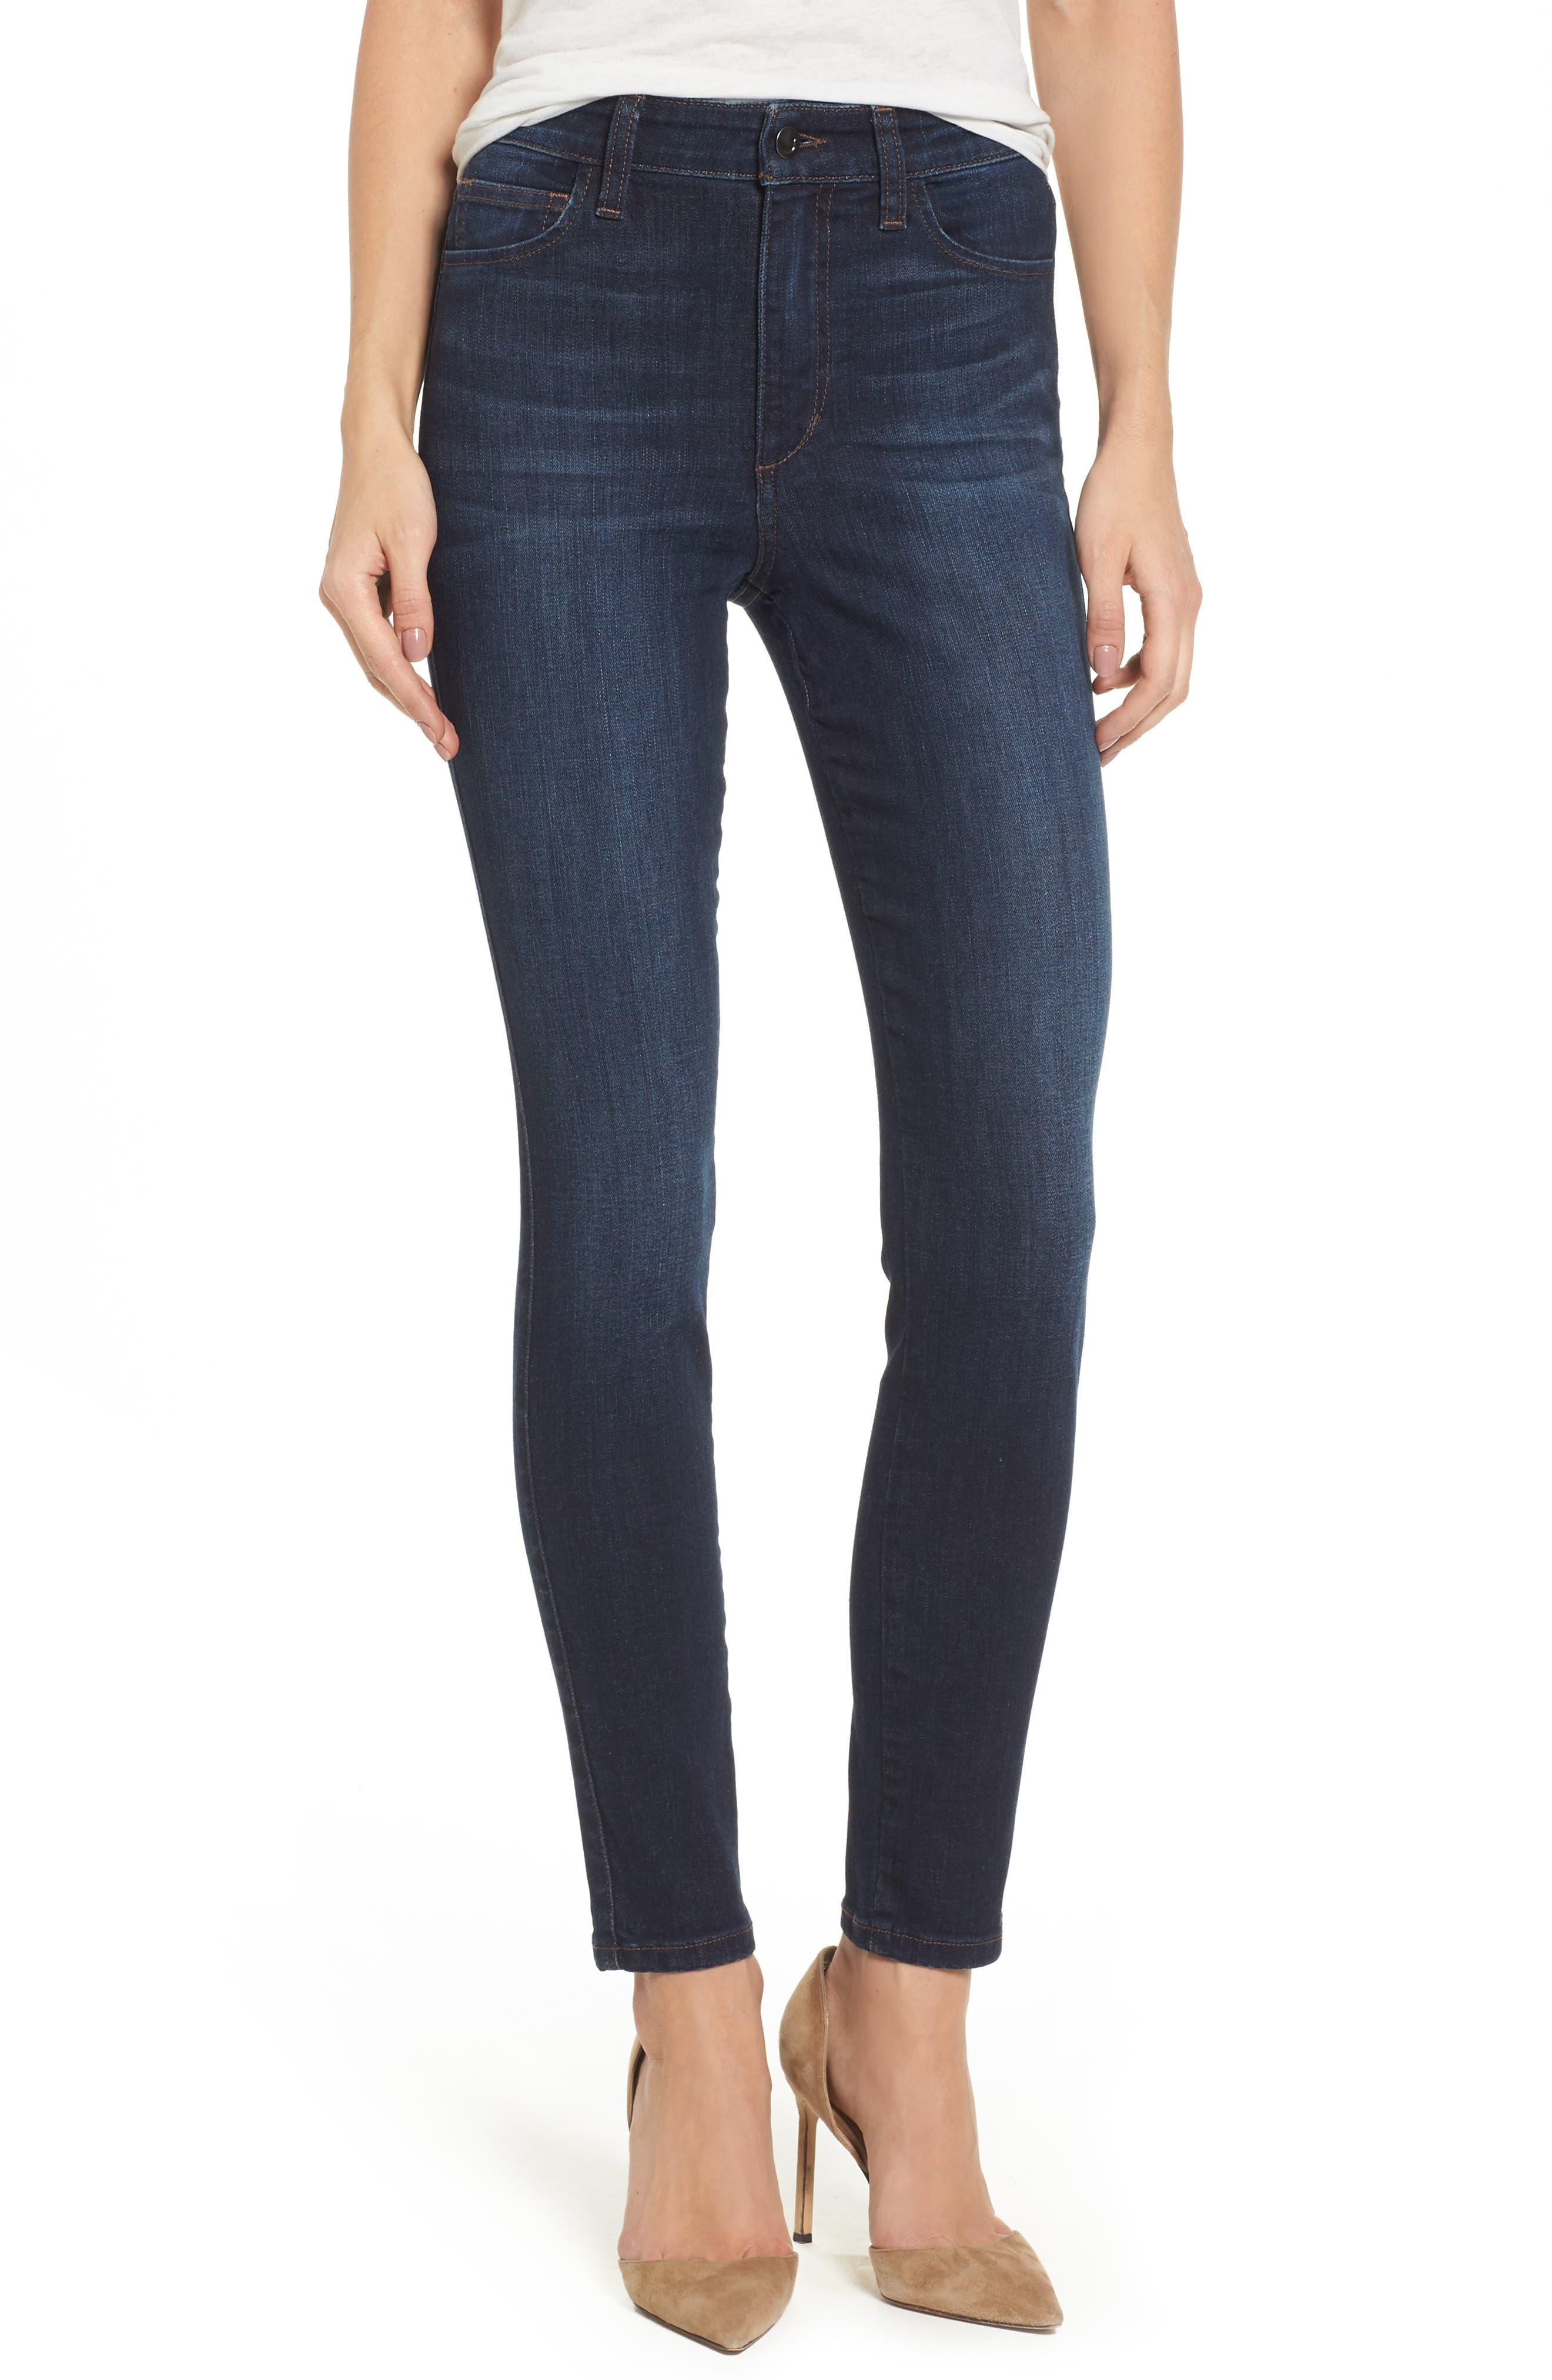 Main Image - Joe's Charlie High Waist Skinny Jeans (Narissa)